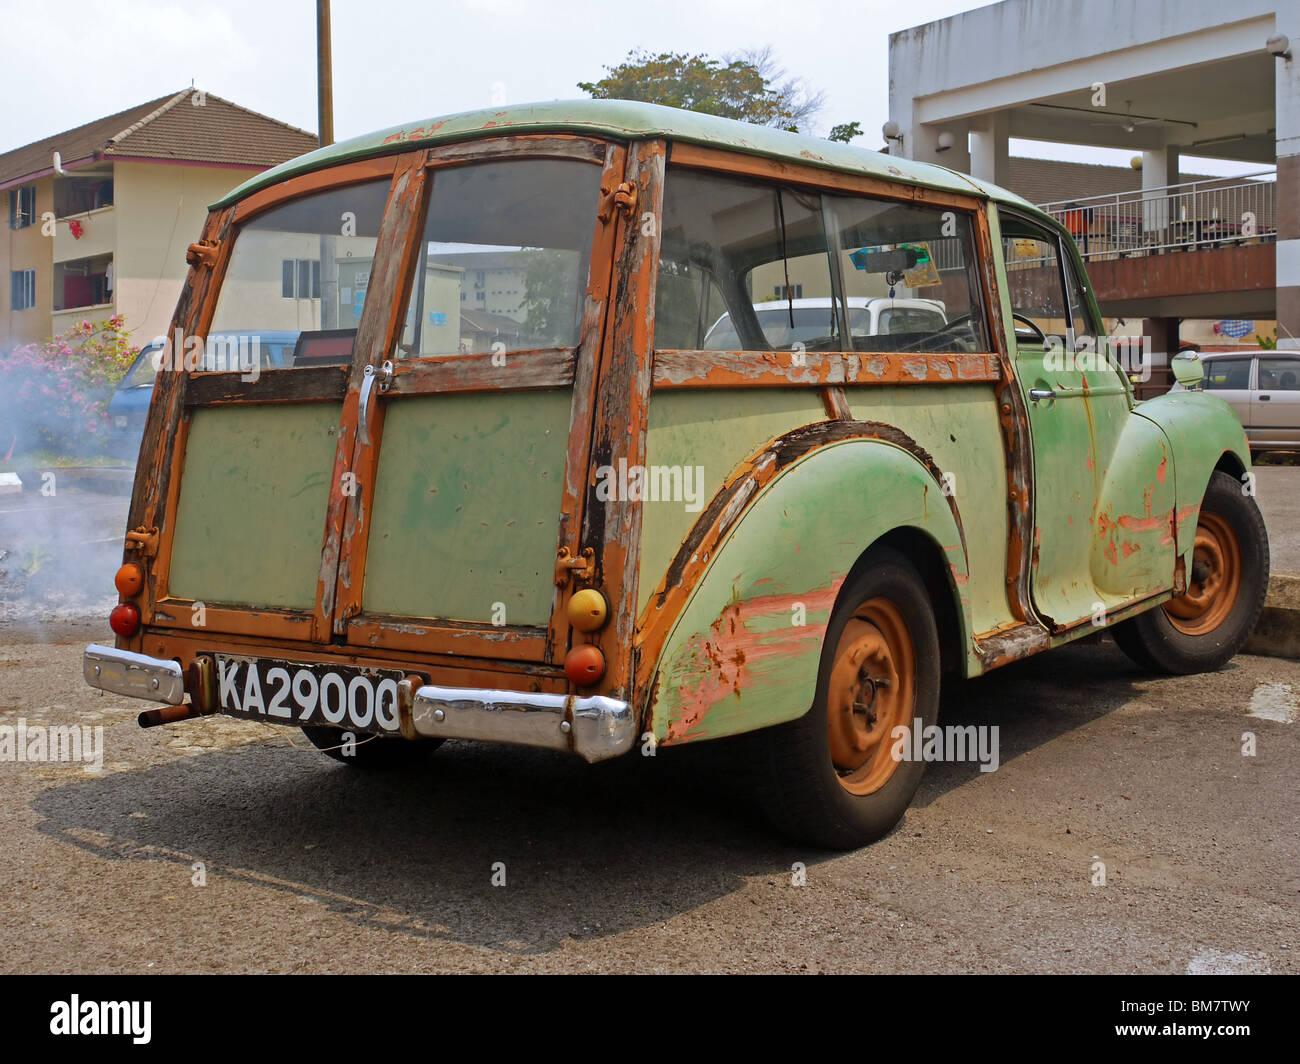 Car sticker design kuching - Very Old Morris Minor Car In Kuching Malaysian Borneo Stock Image